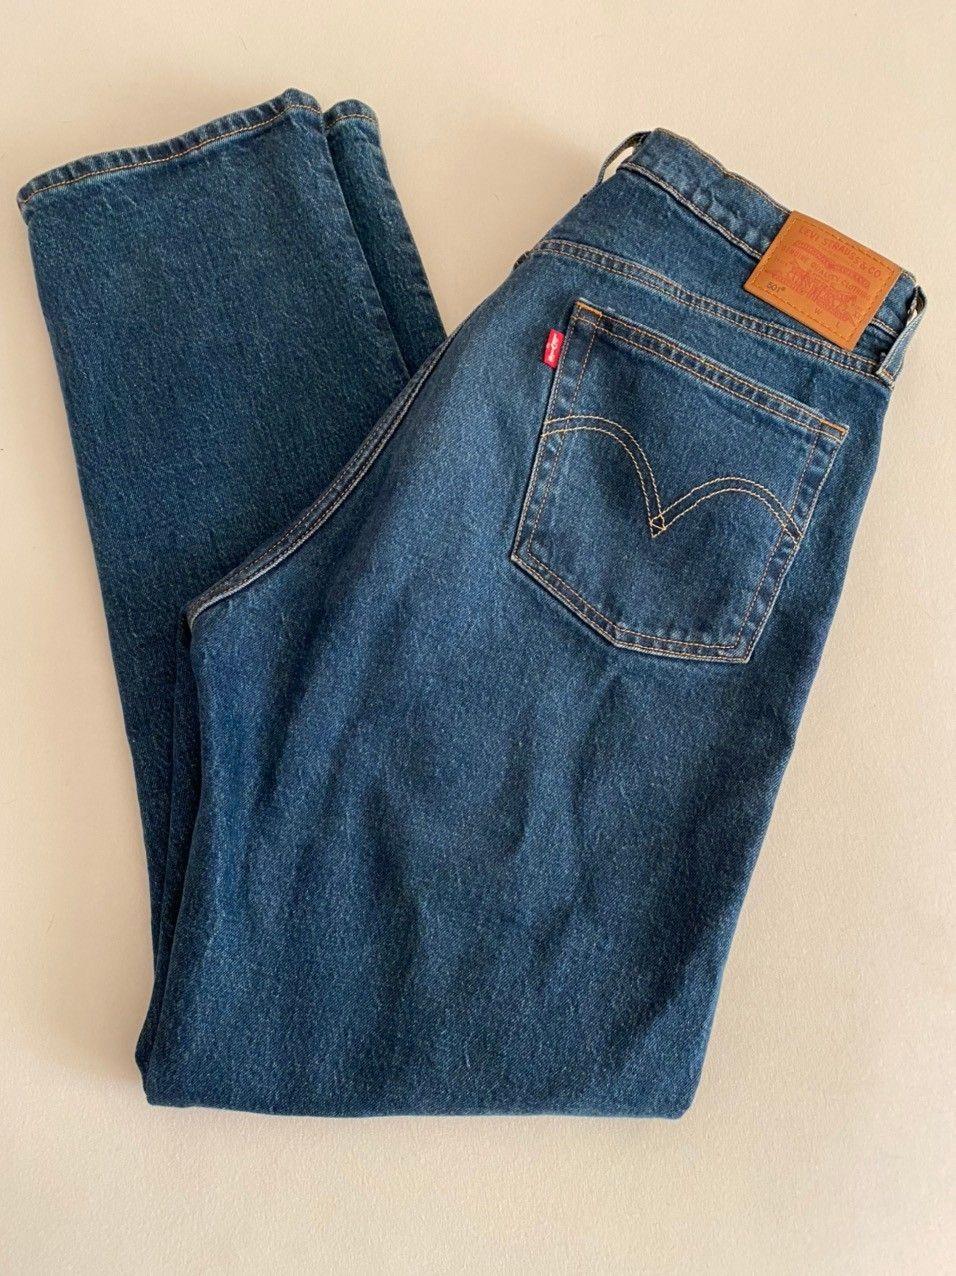 Levis 501 bukse | FINN.no